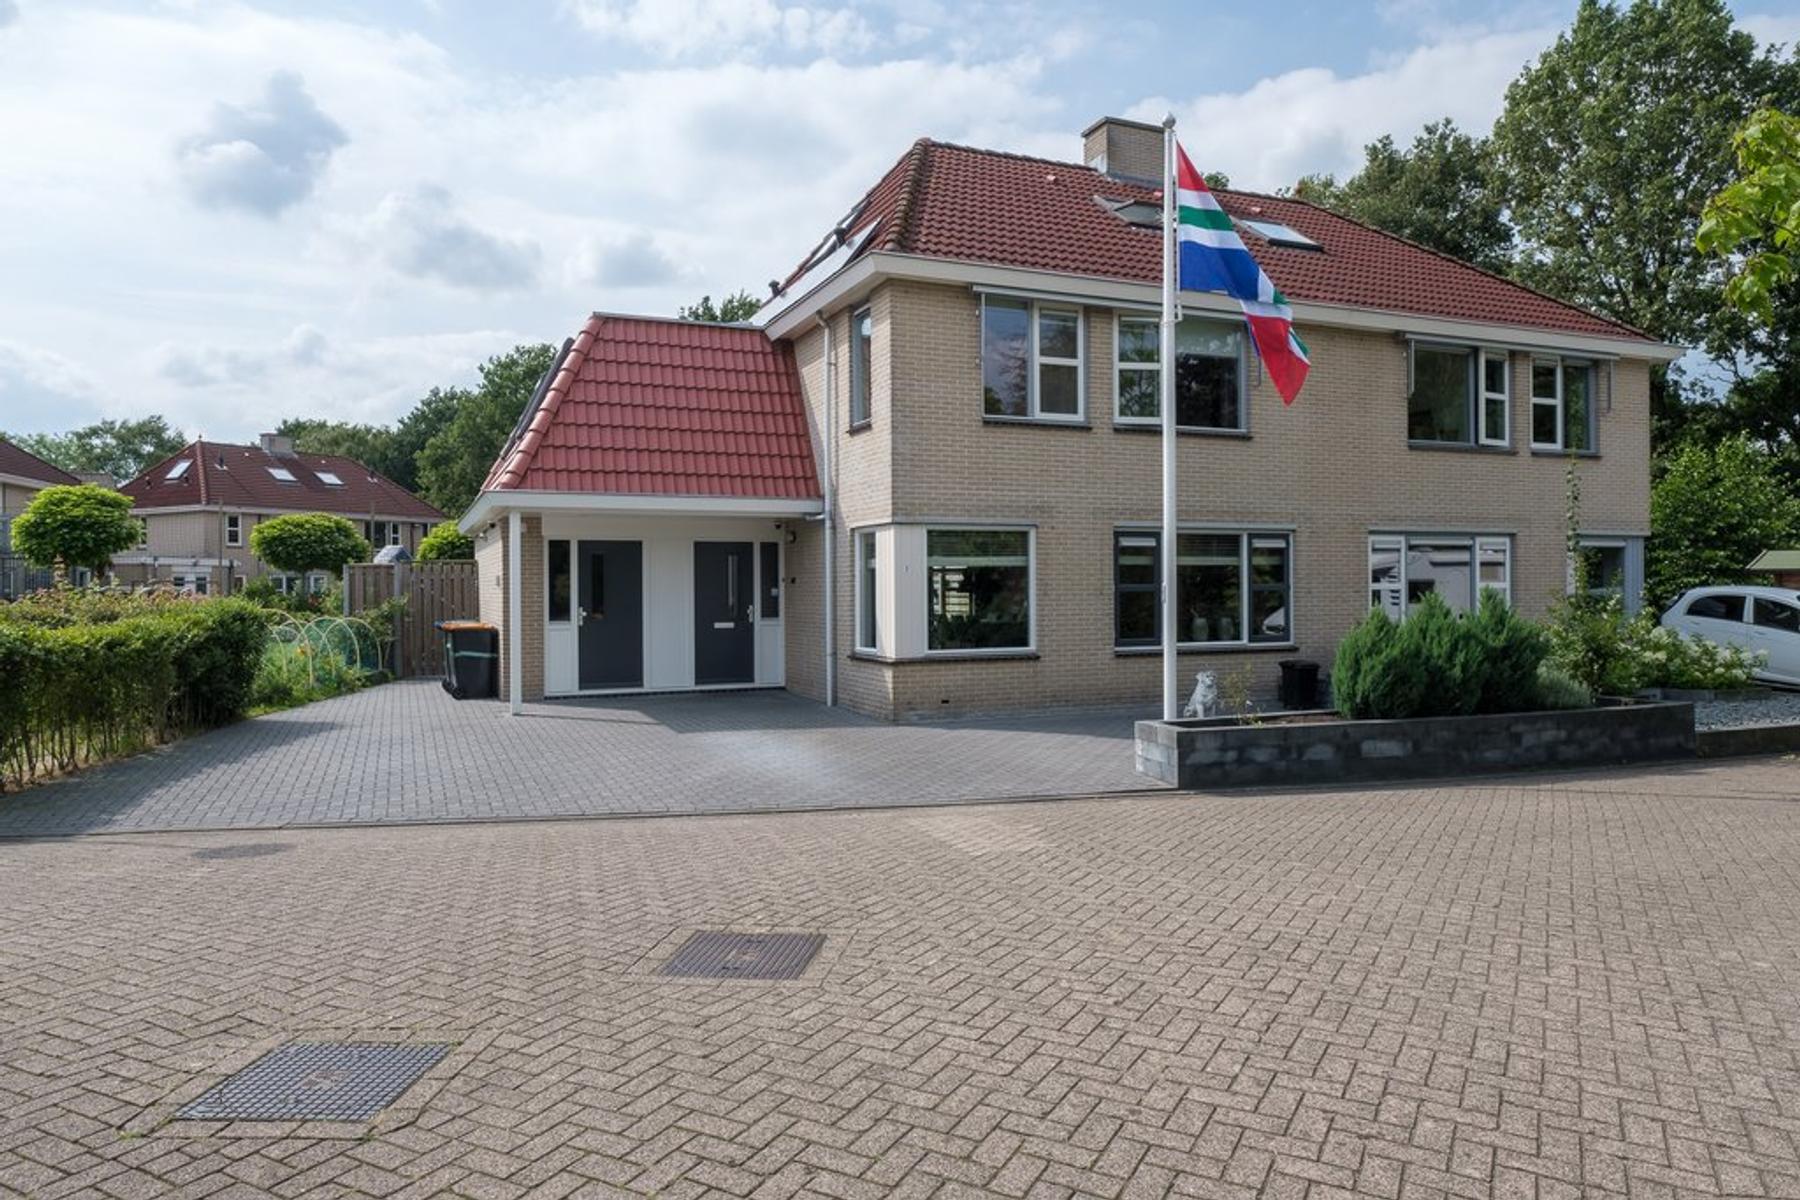 Smaragdstoep 5 in Assen 9403 SE